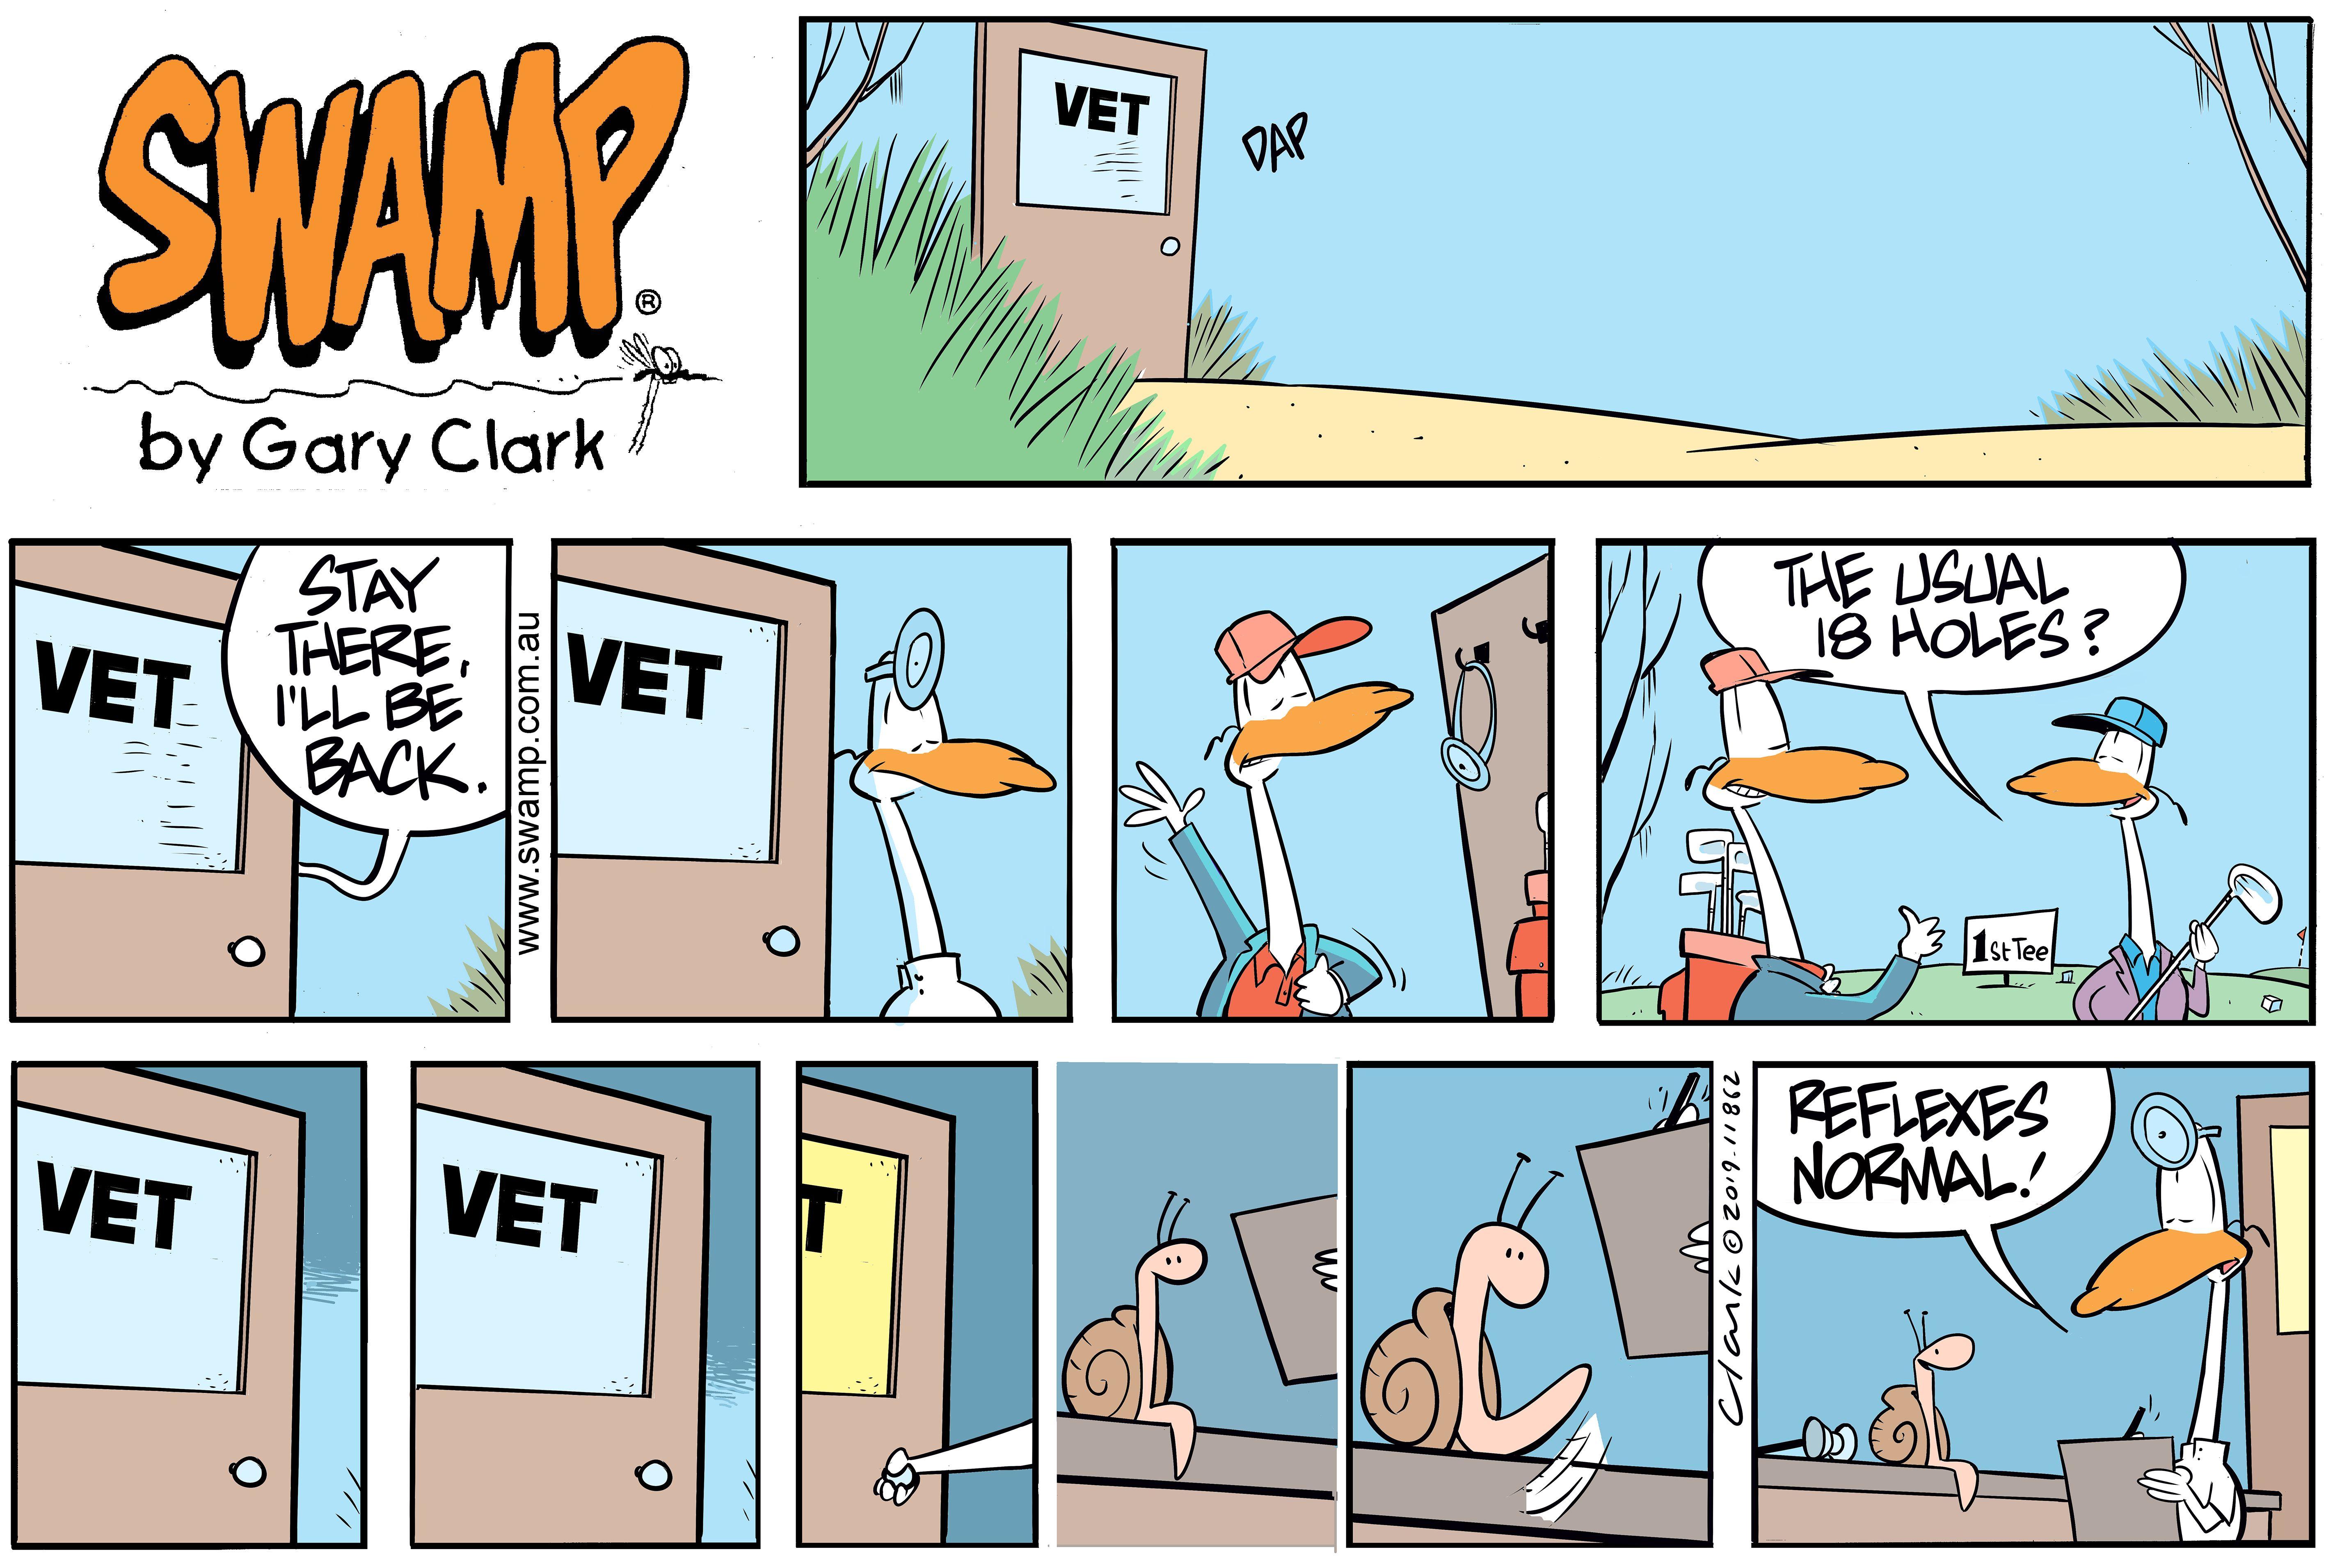 Swamp Vet Tests Reflexes